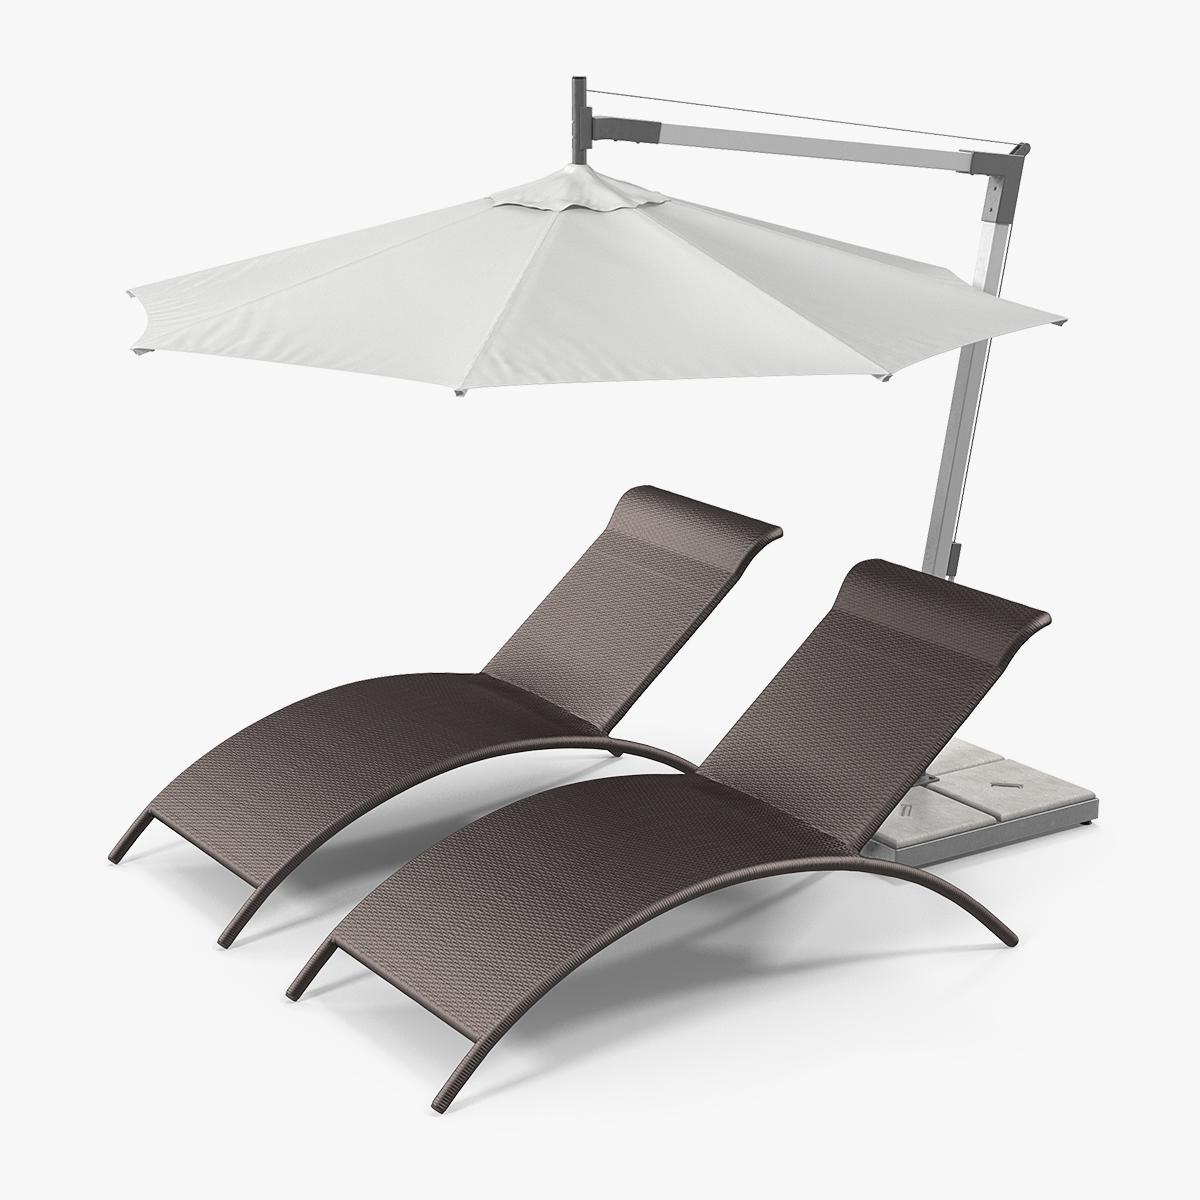 Sun Lounge Chairs Umbrella Model